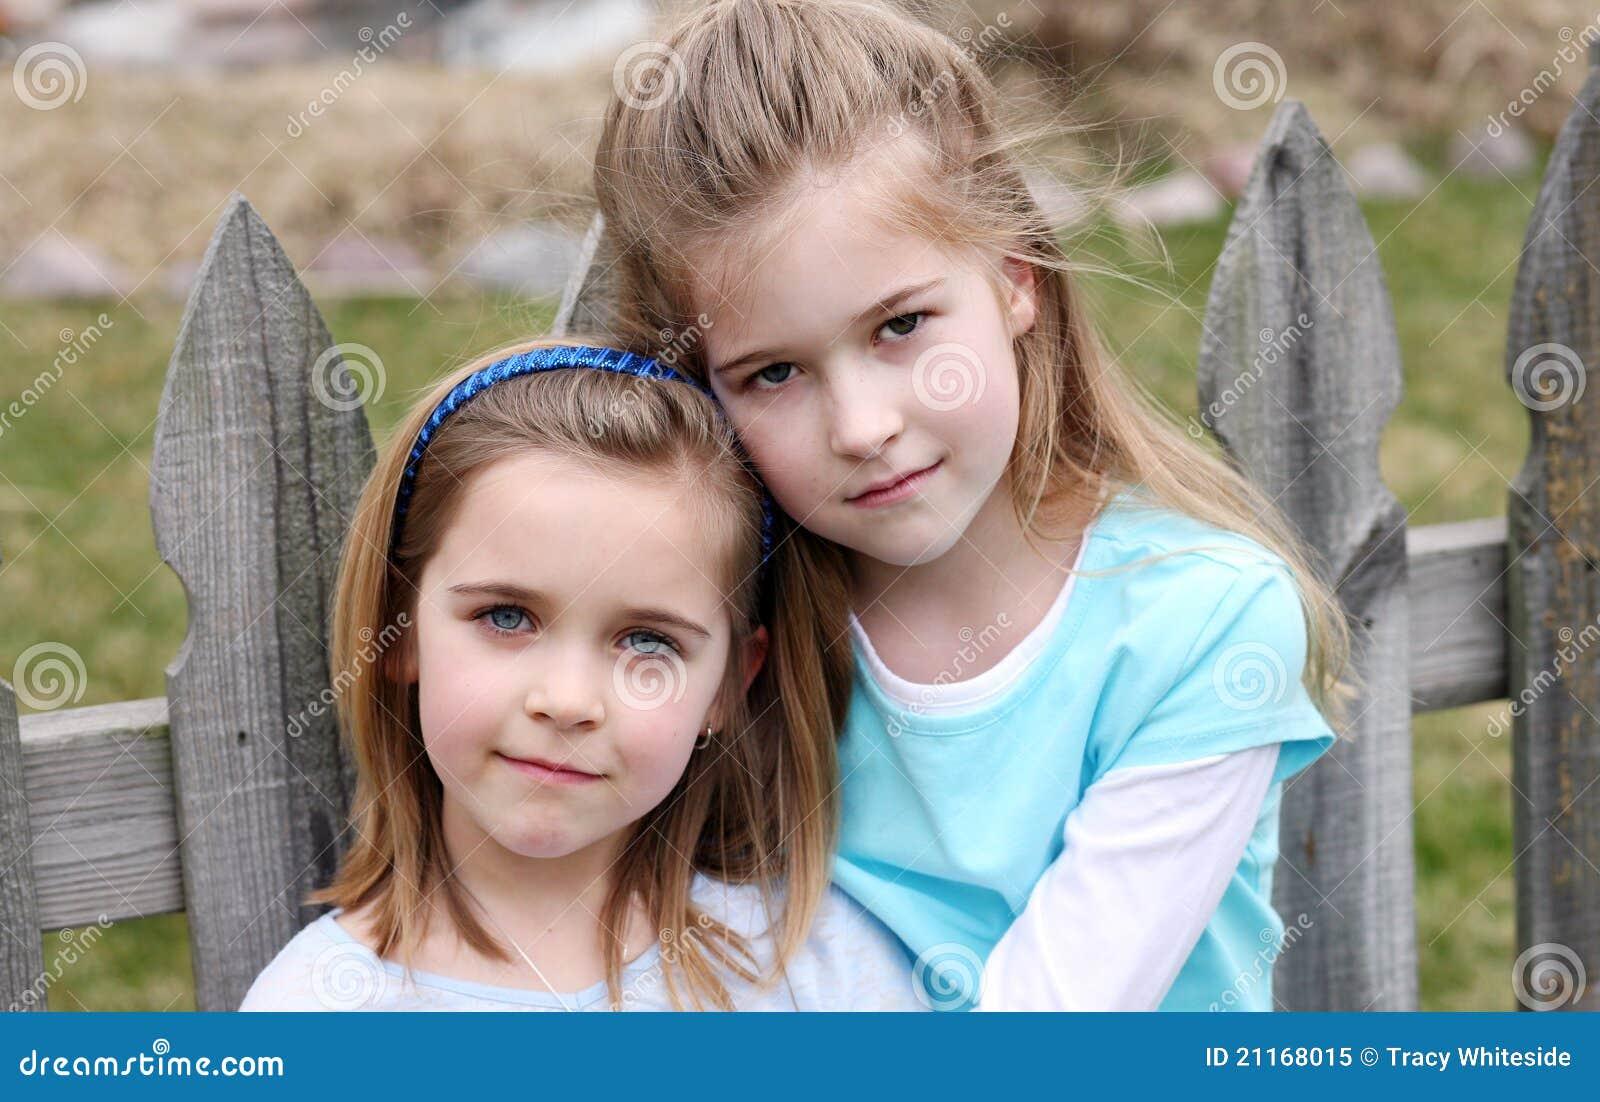 Twee mooie kleine blonde meisjes stock afbeelding afbeelding 21168015 - Foto slaapkamer klein meisje ...